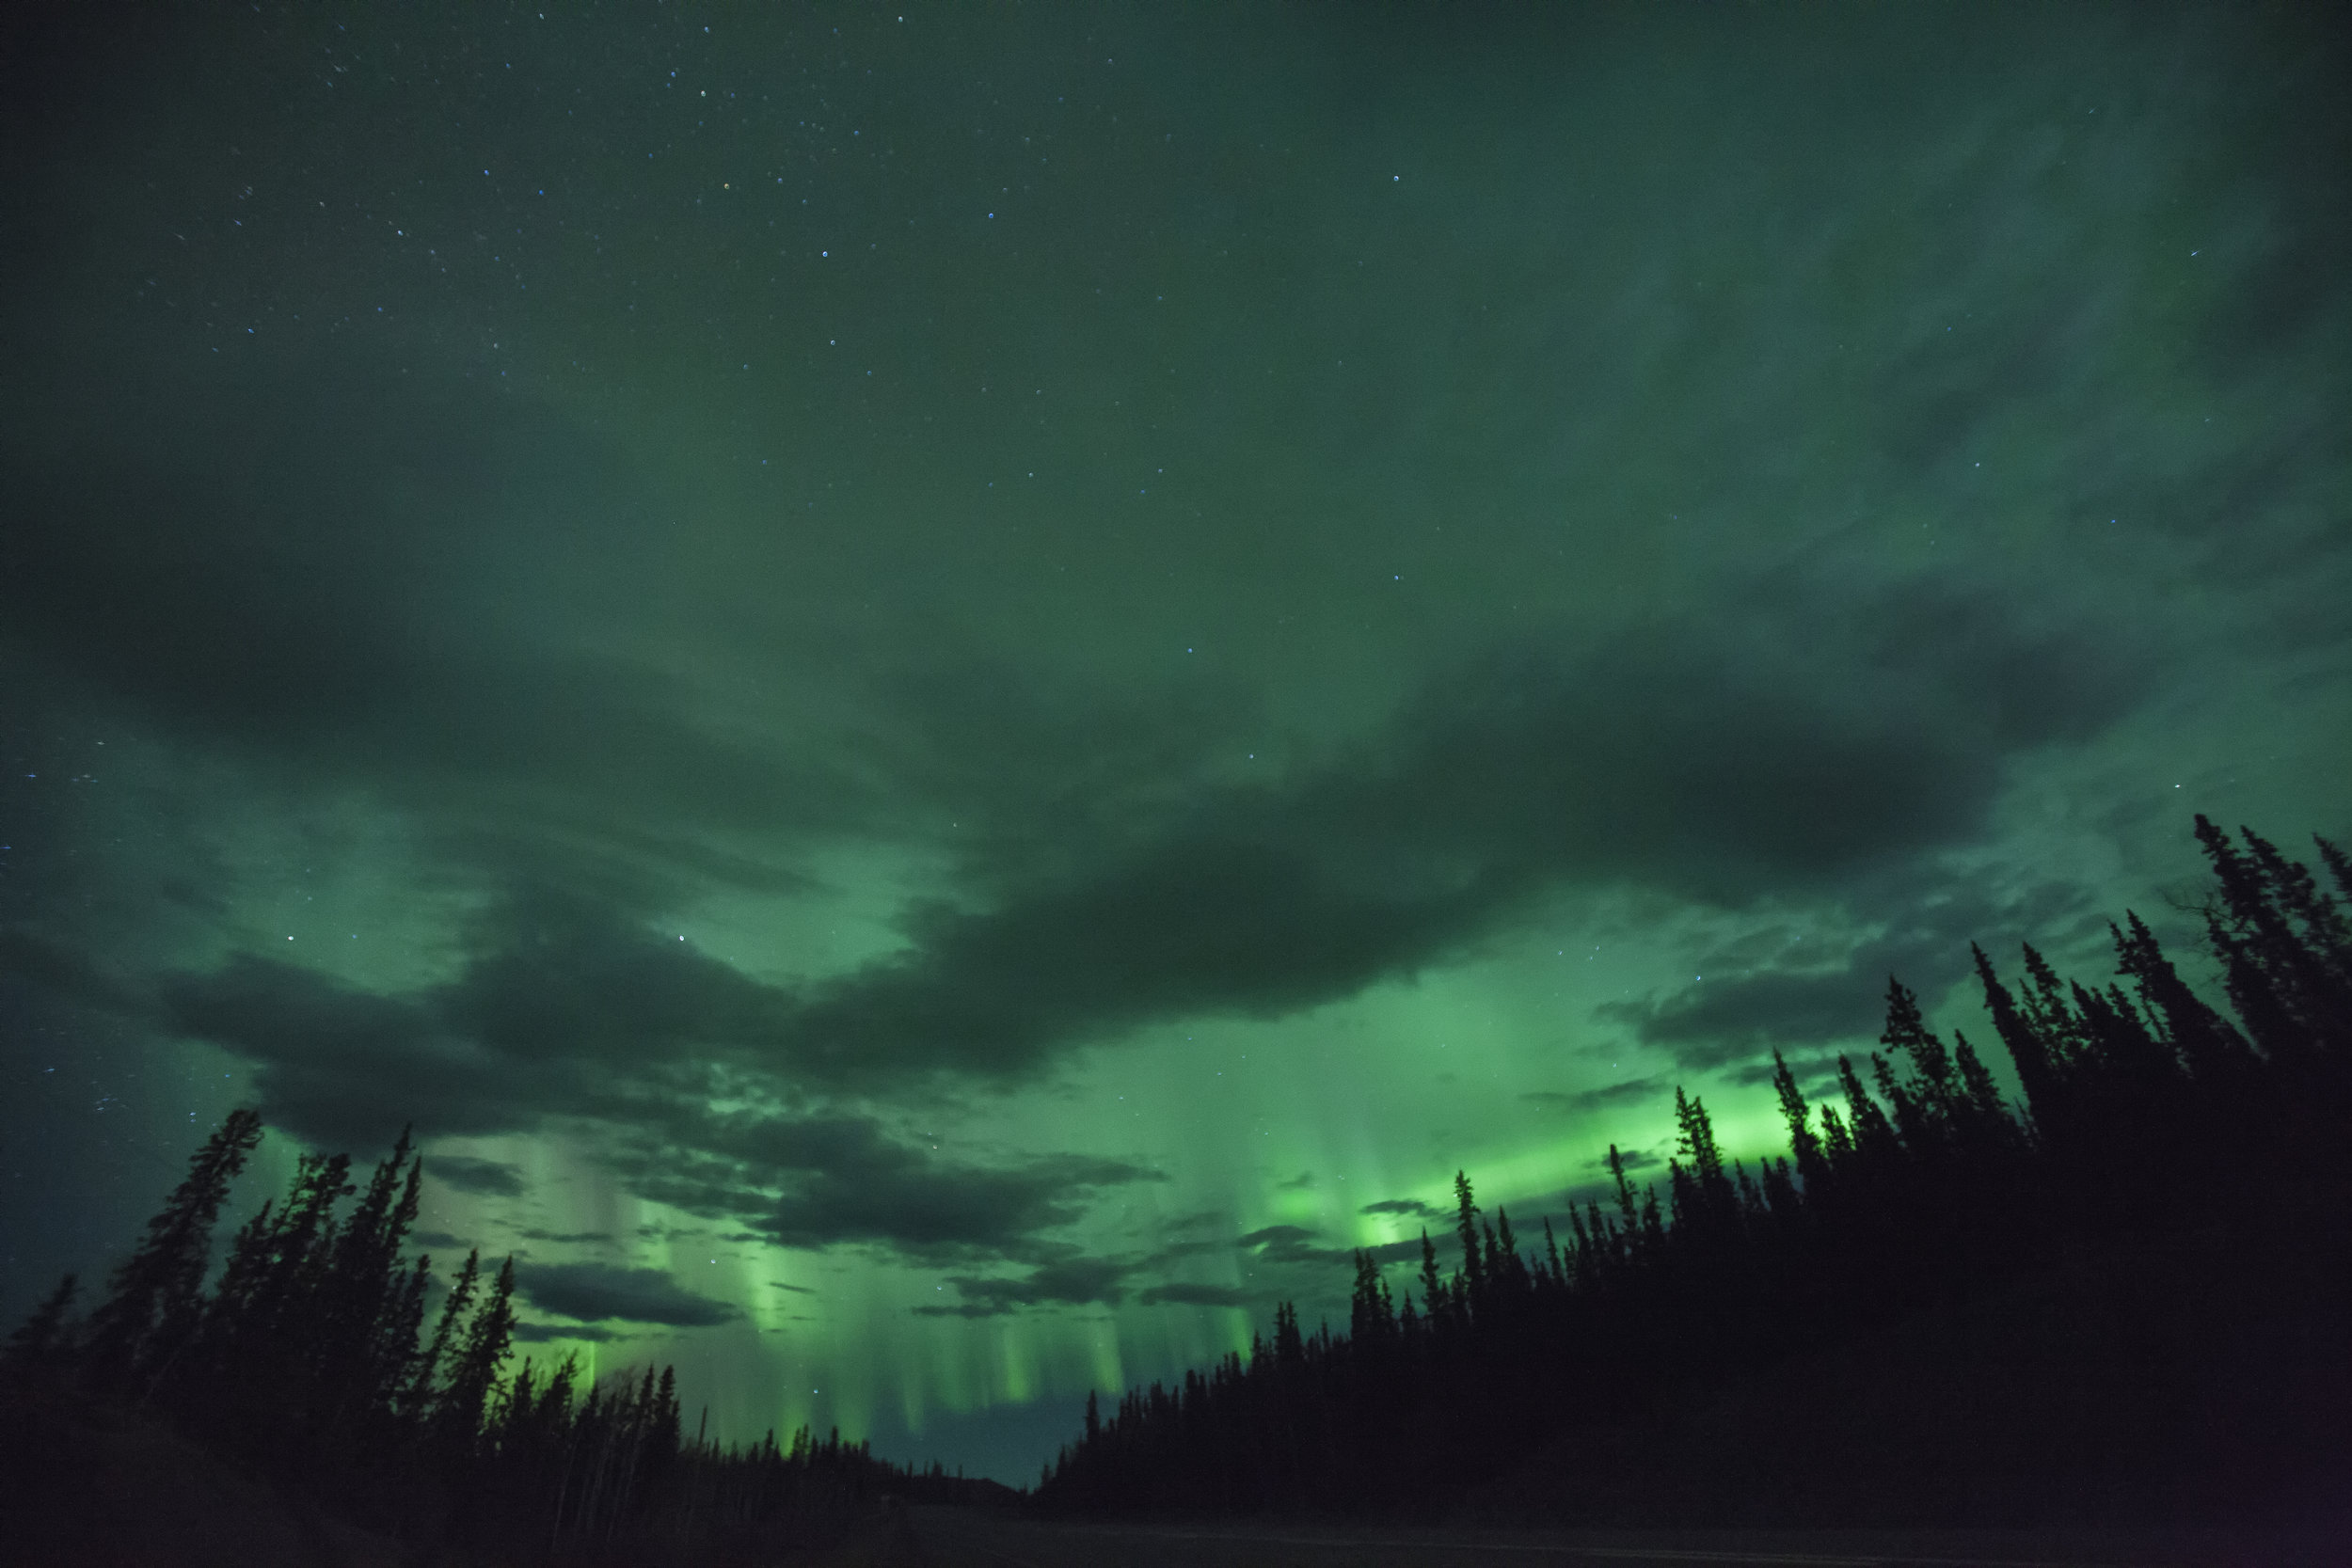 Aurora Borealis - Across the Blue Planet